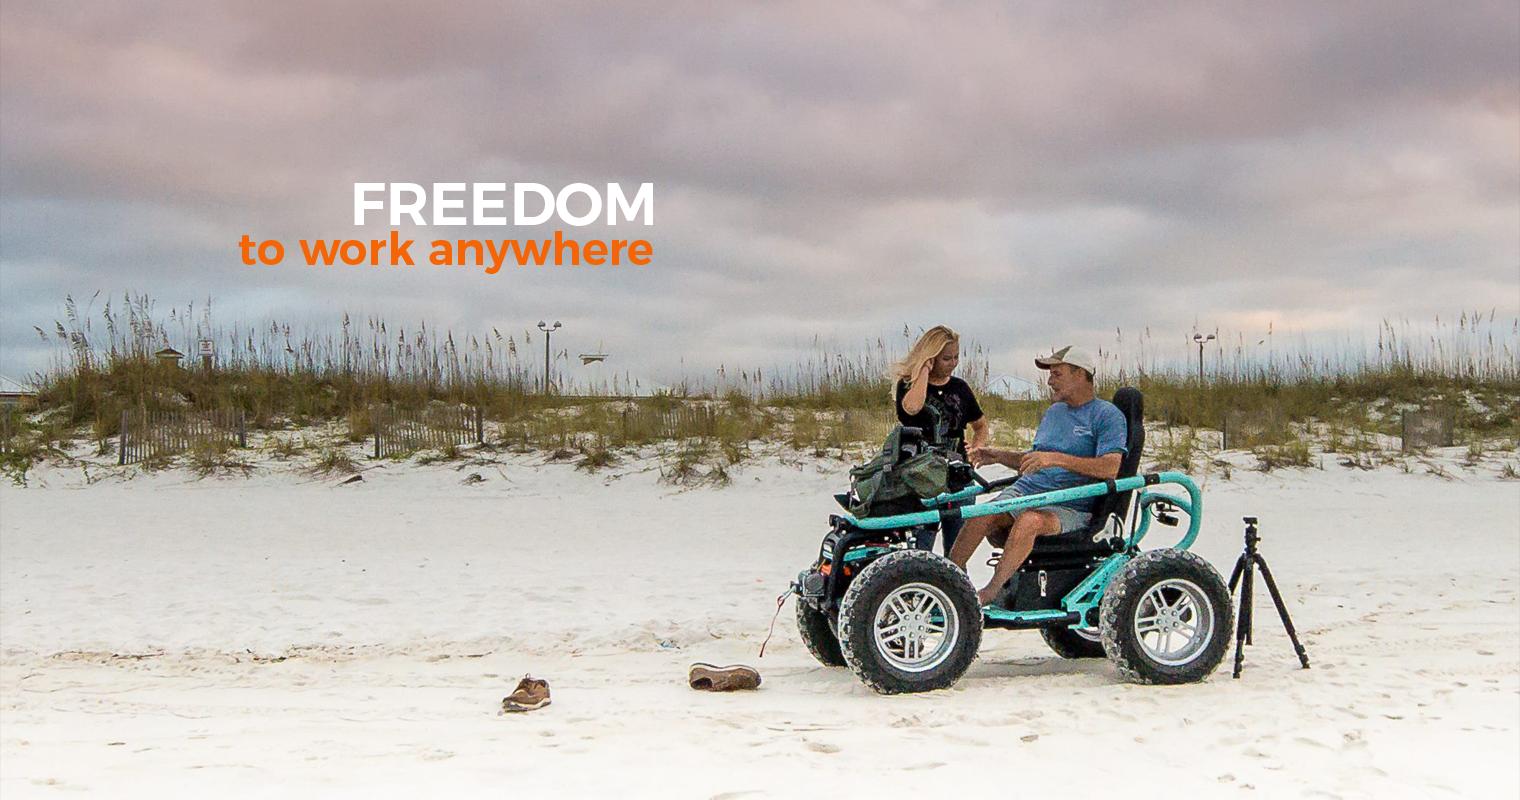 slide-10-terrainhopper-freedom-work-anywhere-beach-sand